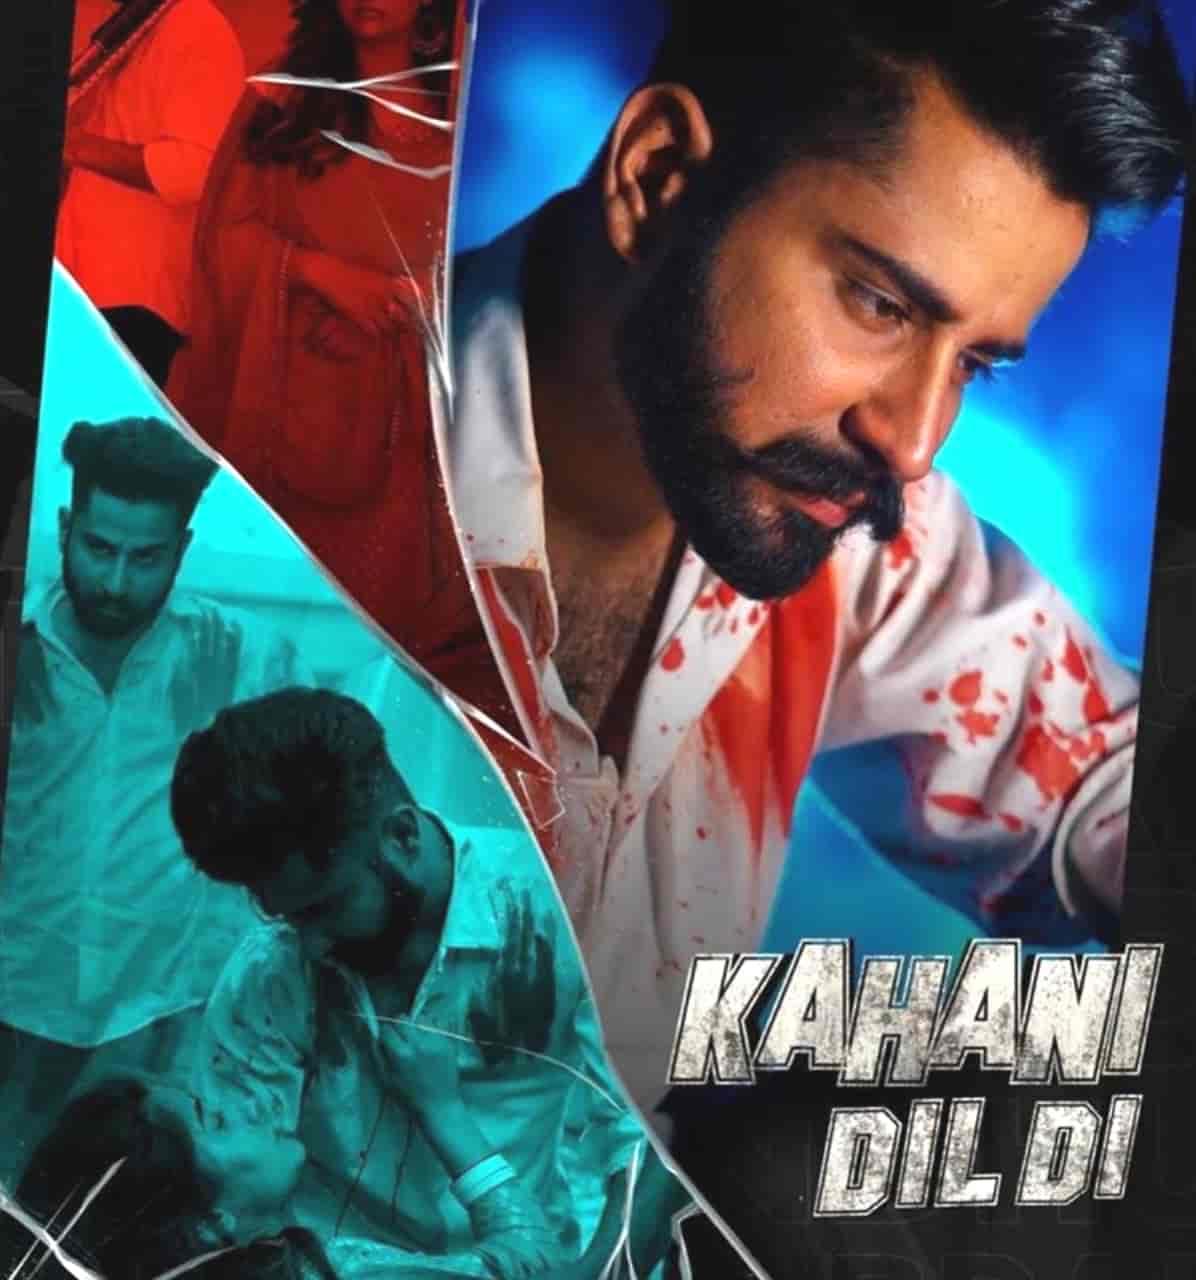 Kahani Dil Di Punjabi Song Image Features Varinder Brar